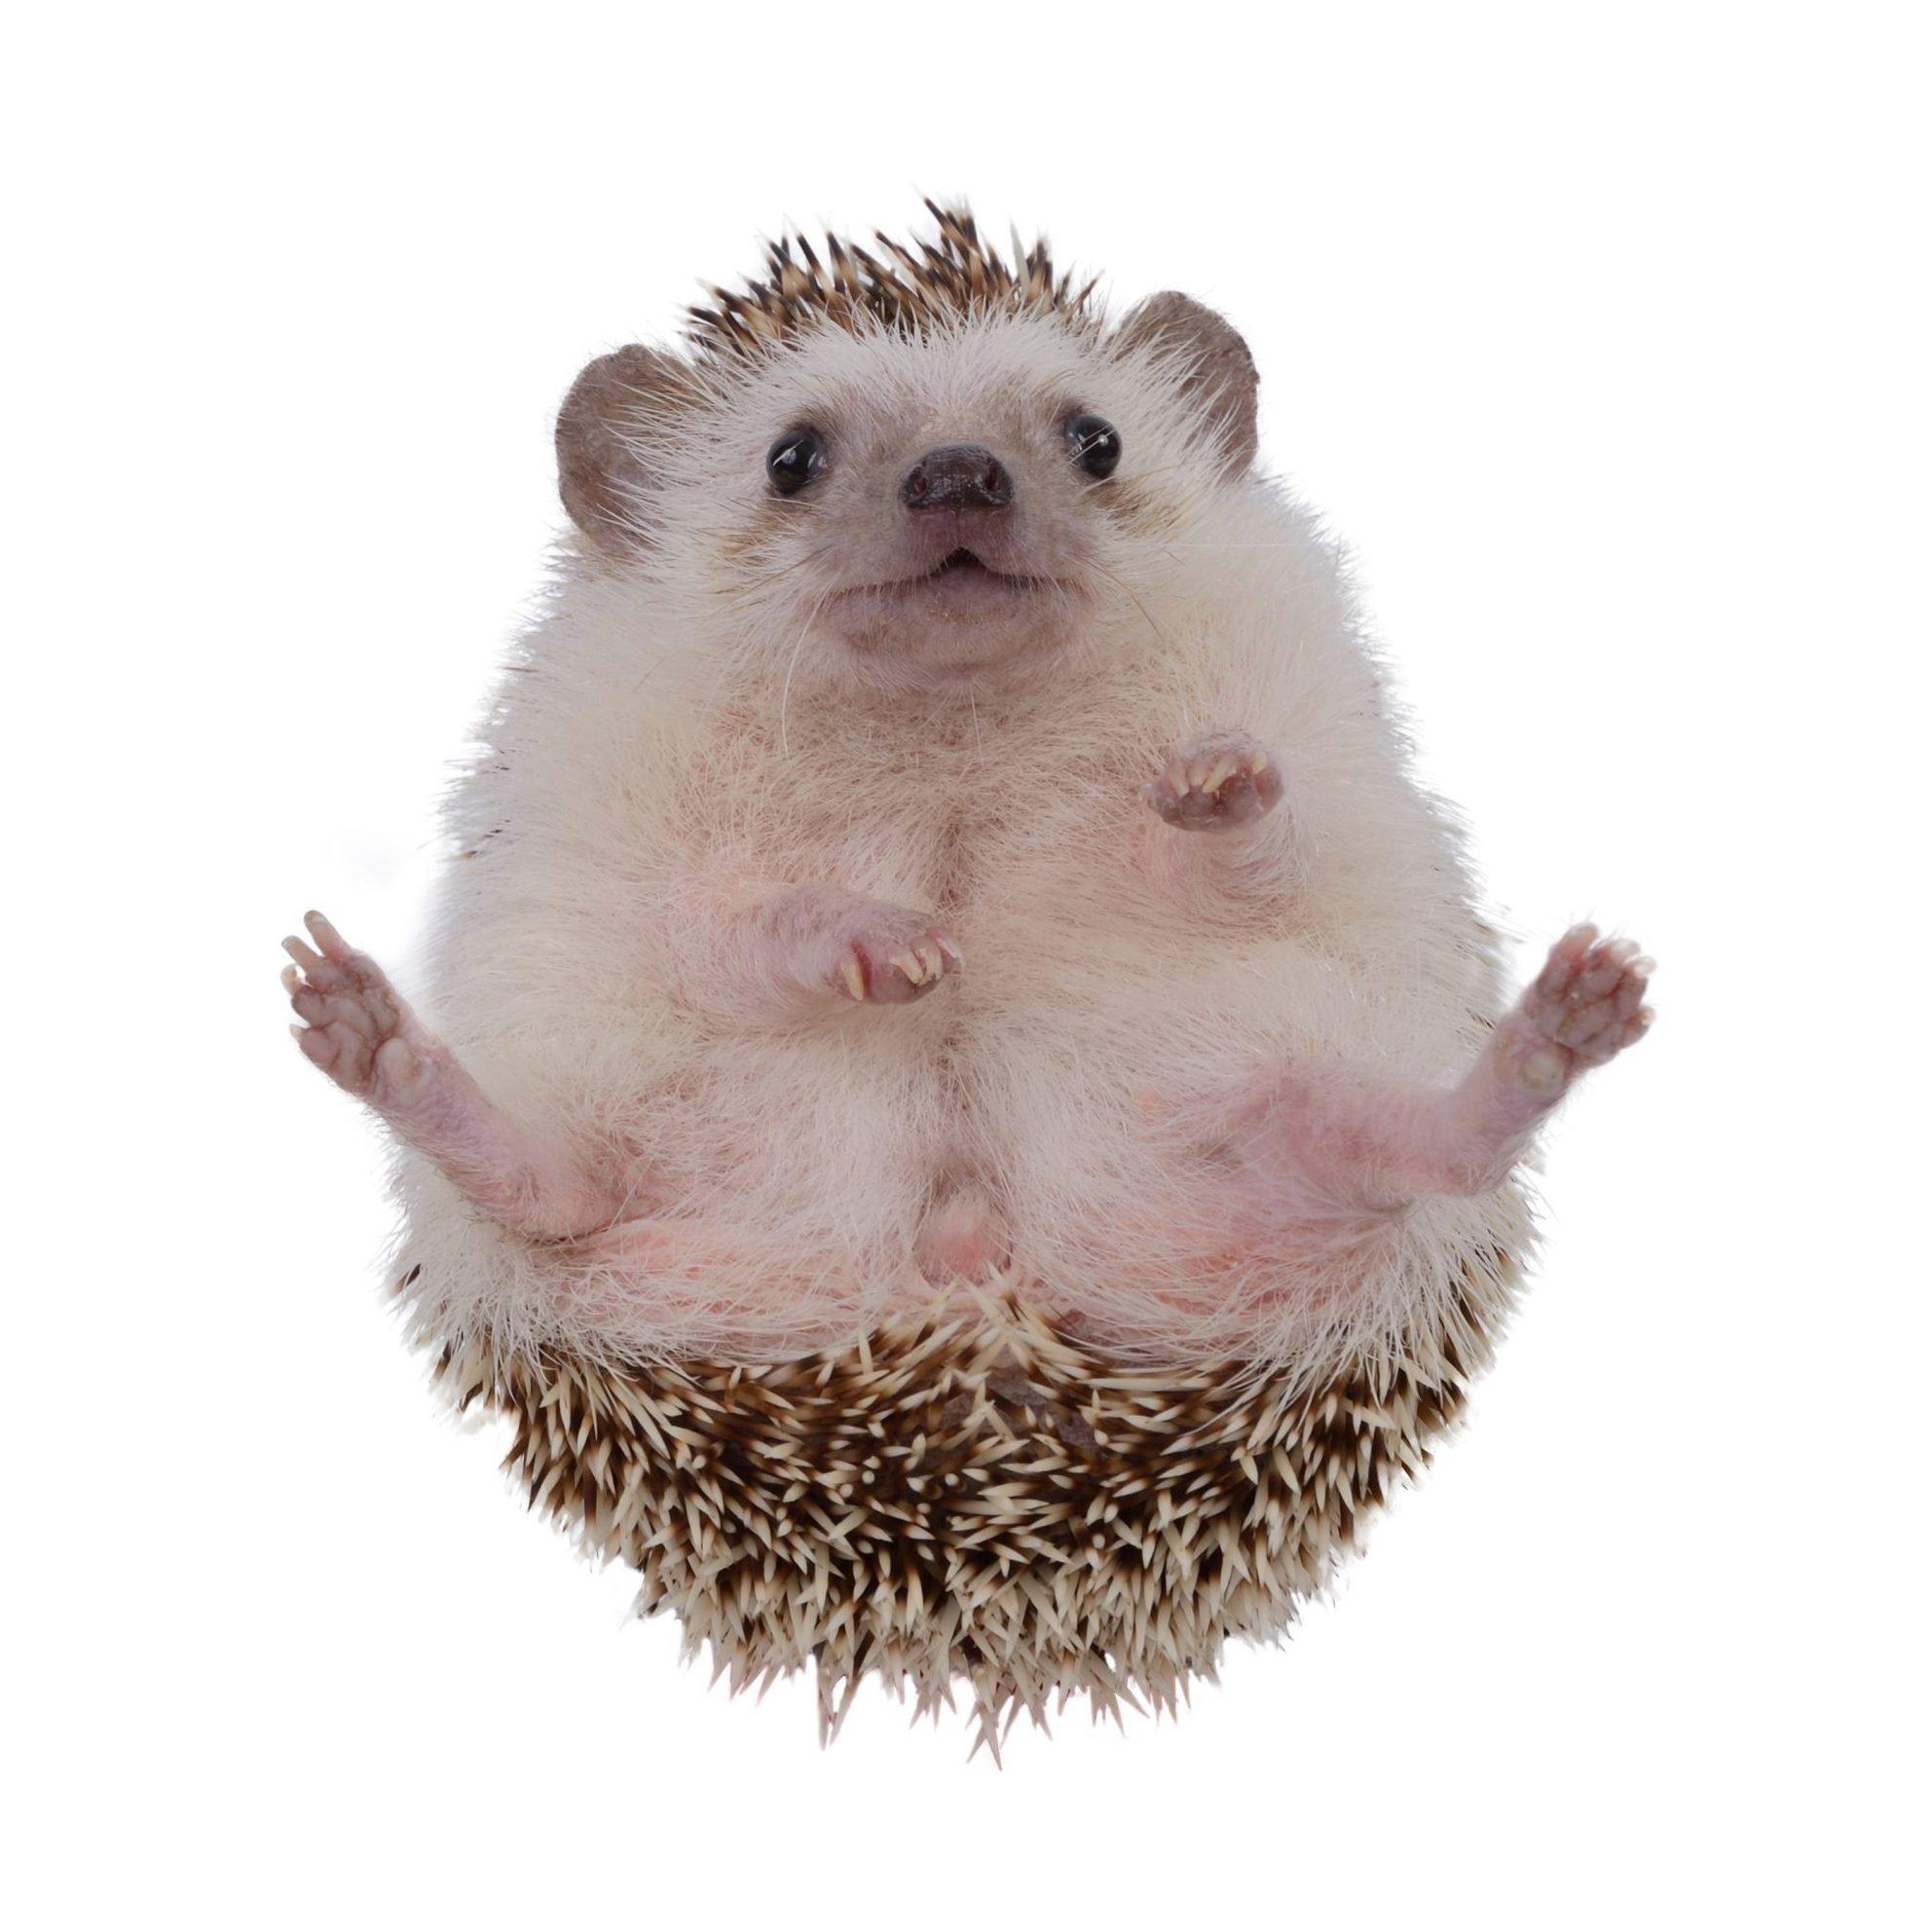 Small hedgehog upturned .